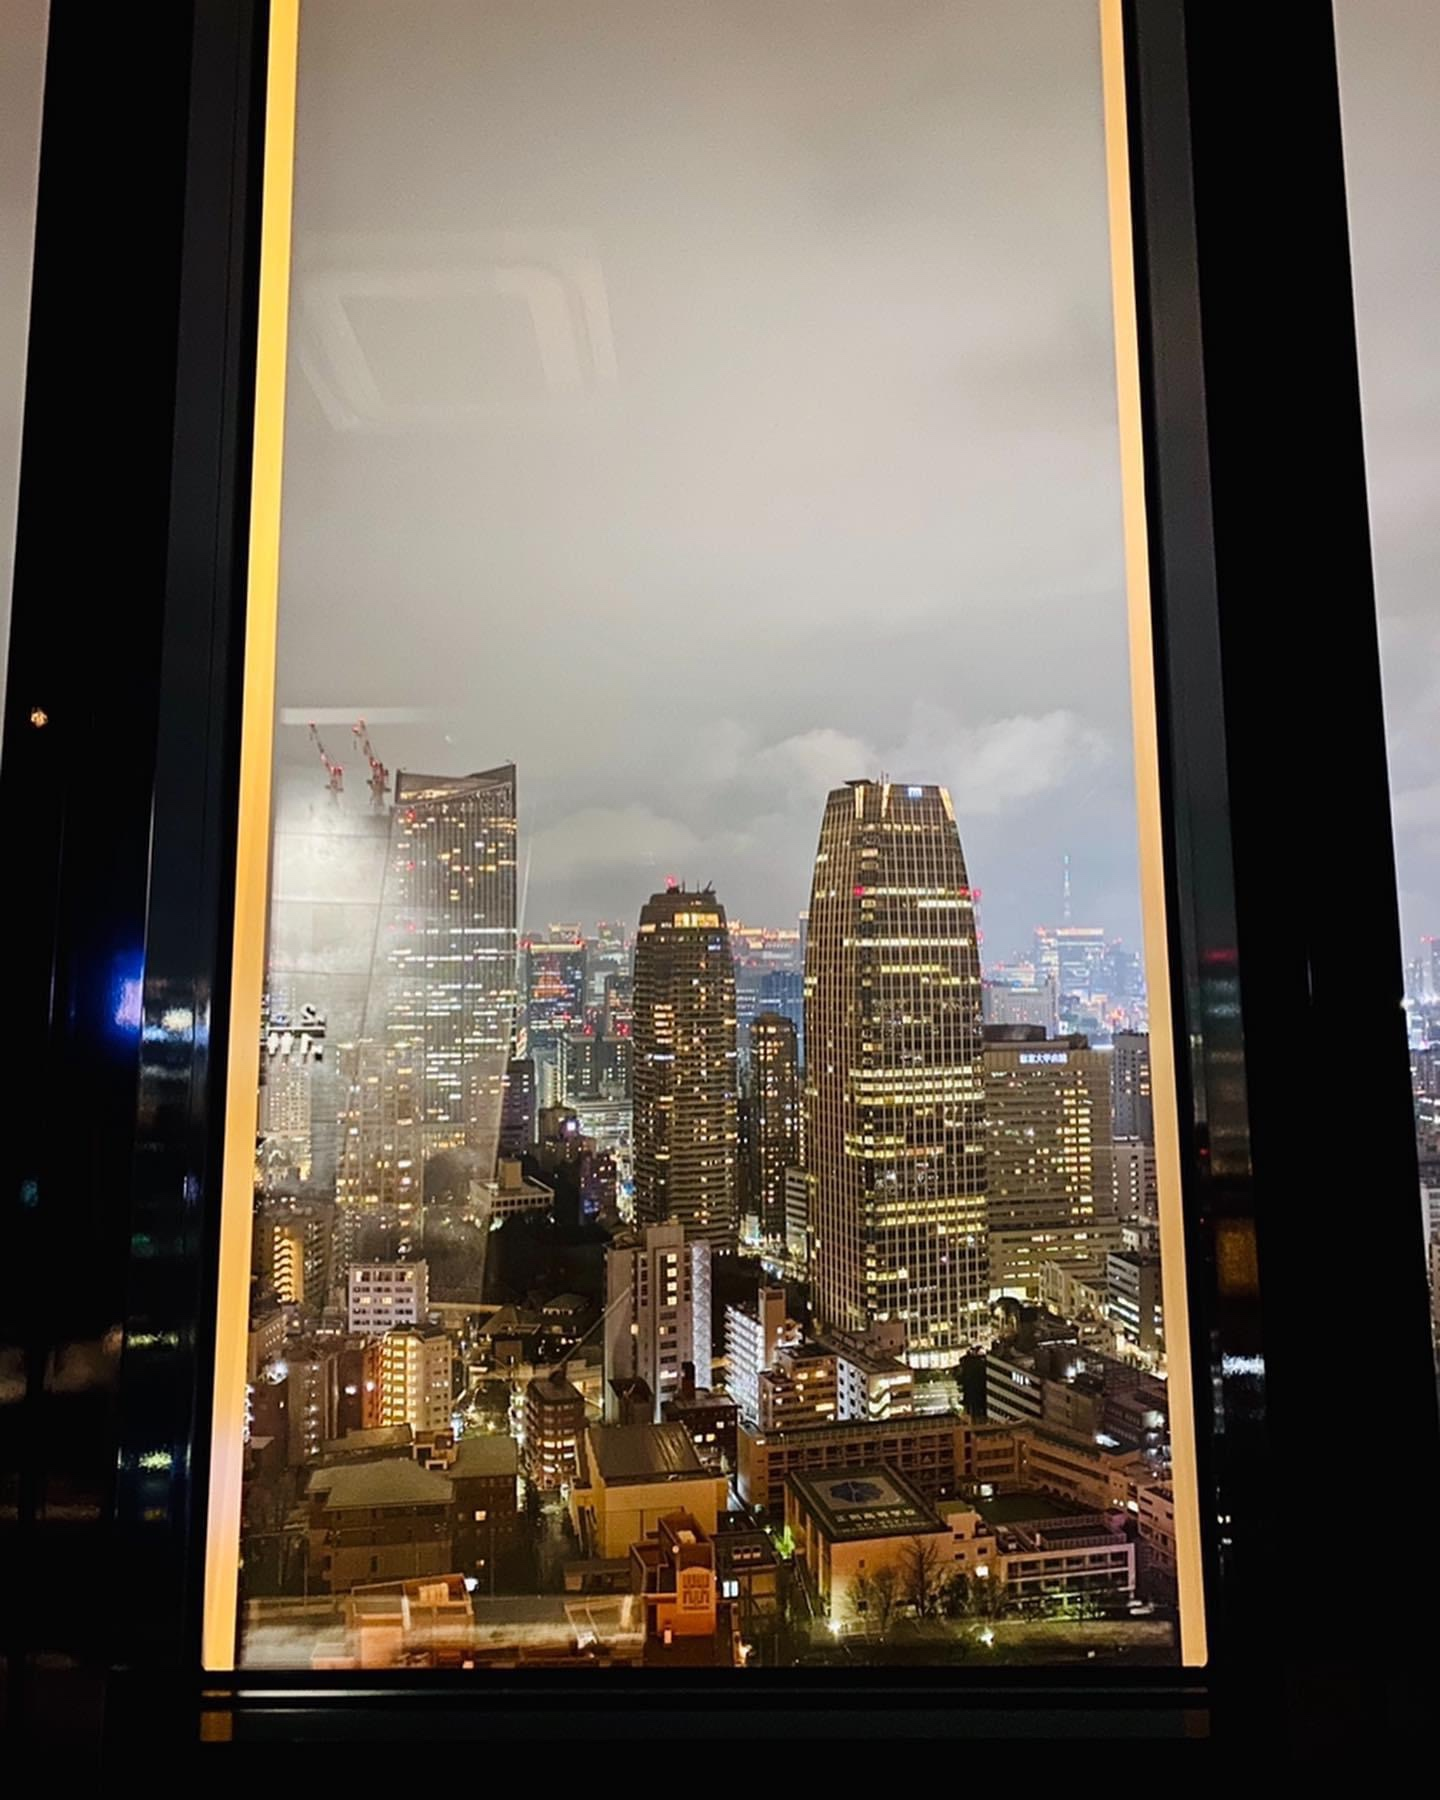 Tokyo Tower - diywithjoy.com